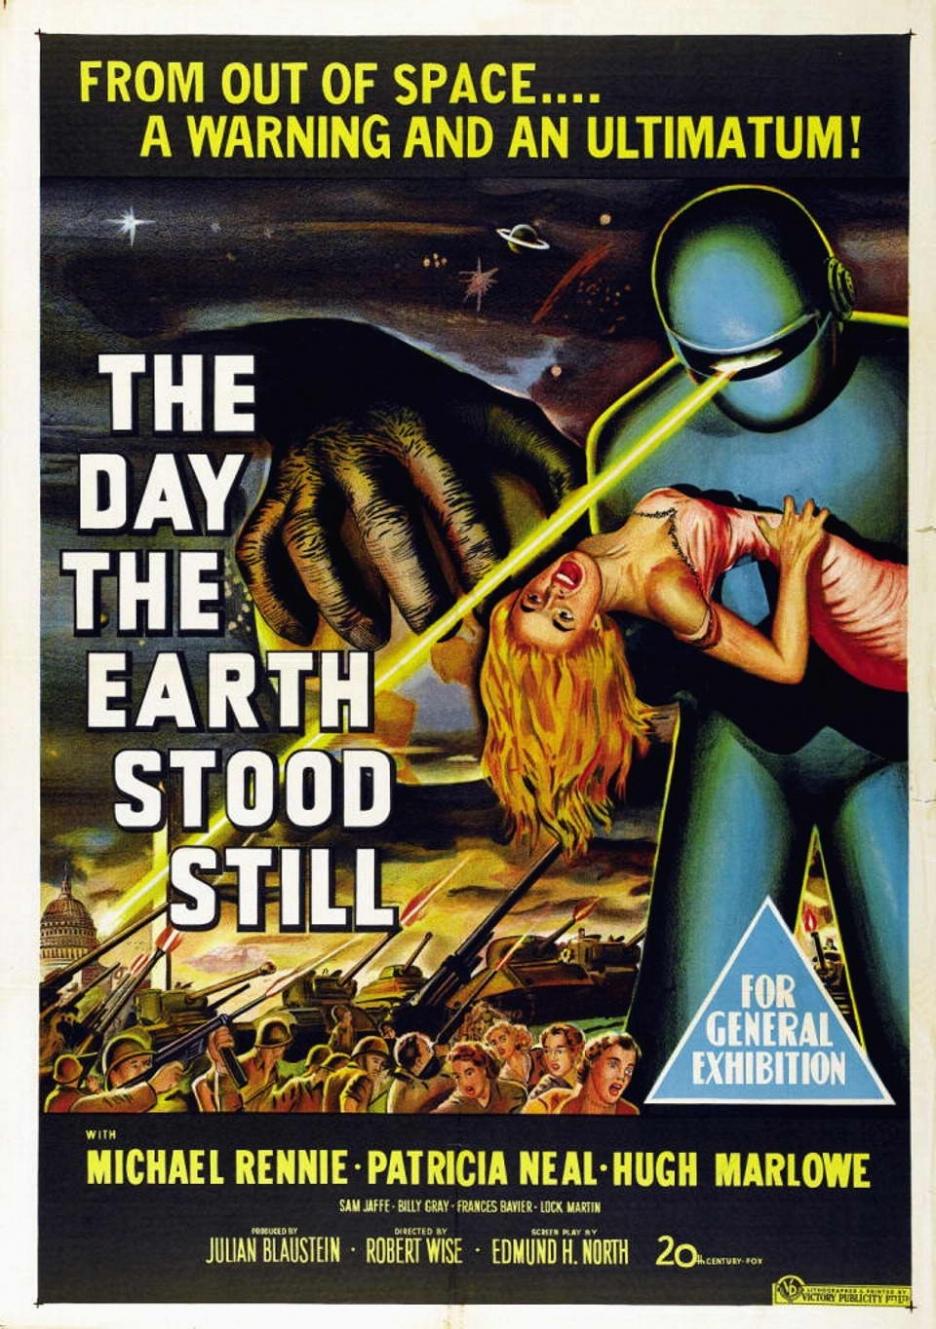 day_the_earth_stood_still_poster_1951_01.jpg